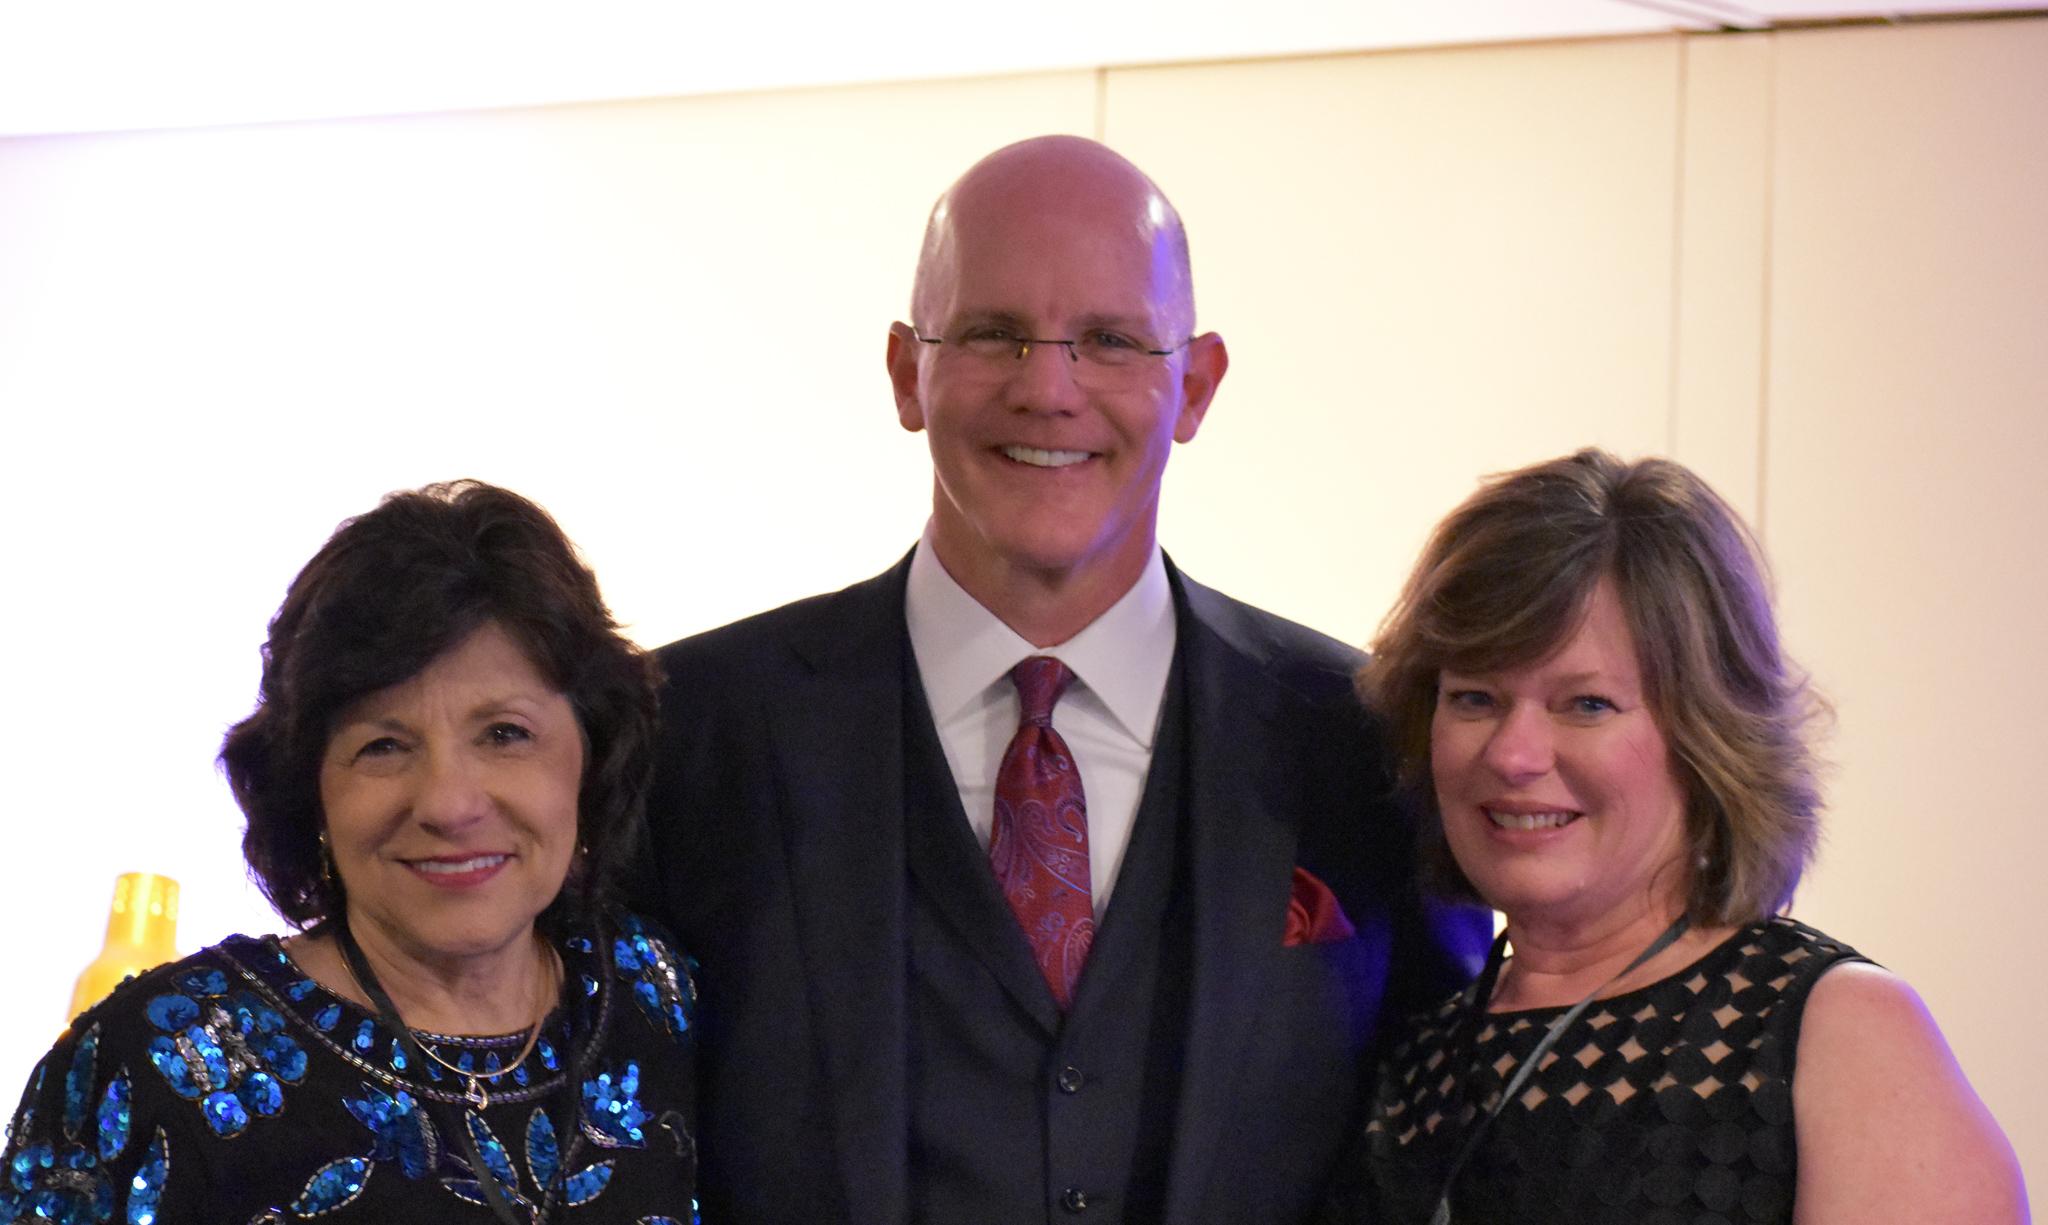 Marie Hyder, Kerry Wilkerson & Marie Colturi